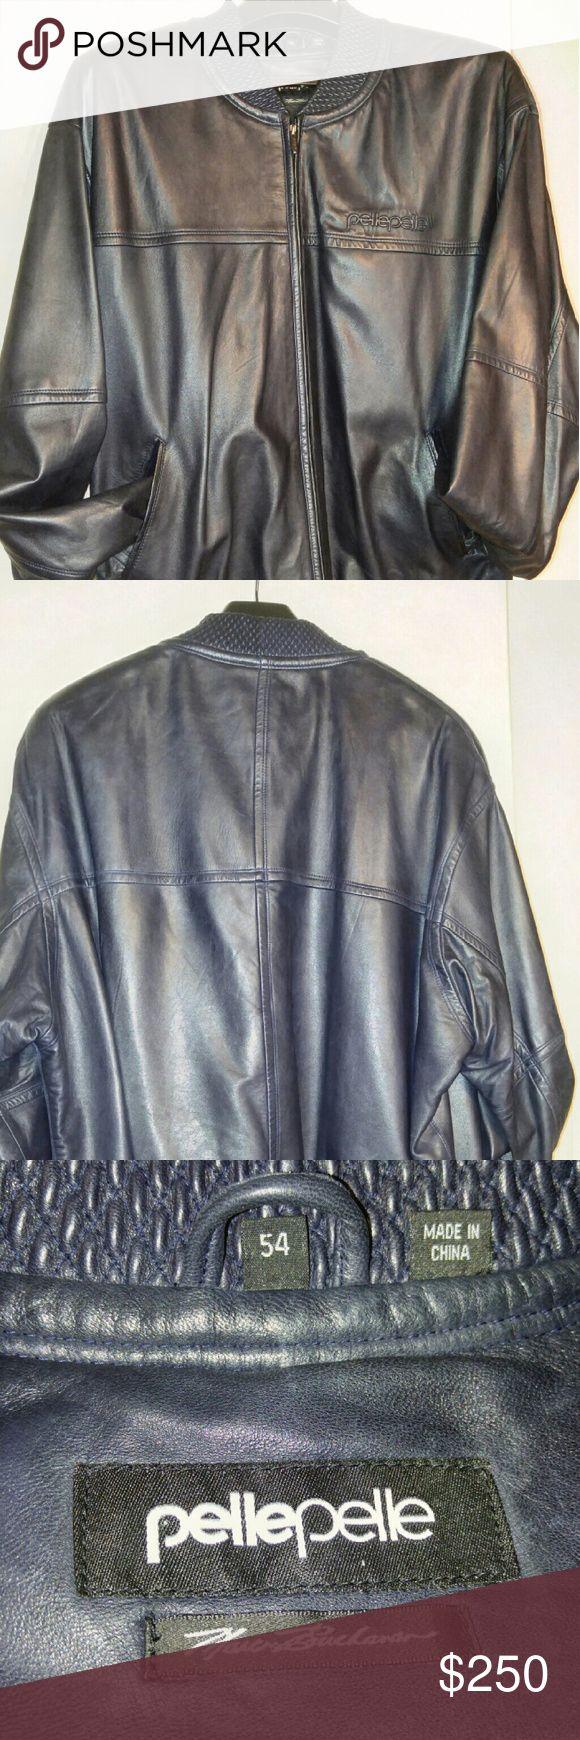 Leather Pelle Jacket Best Offer Navy Blue Pelle Jacket Pelle Pelle Jackets & Coats Bomber & Varsity